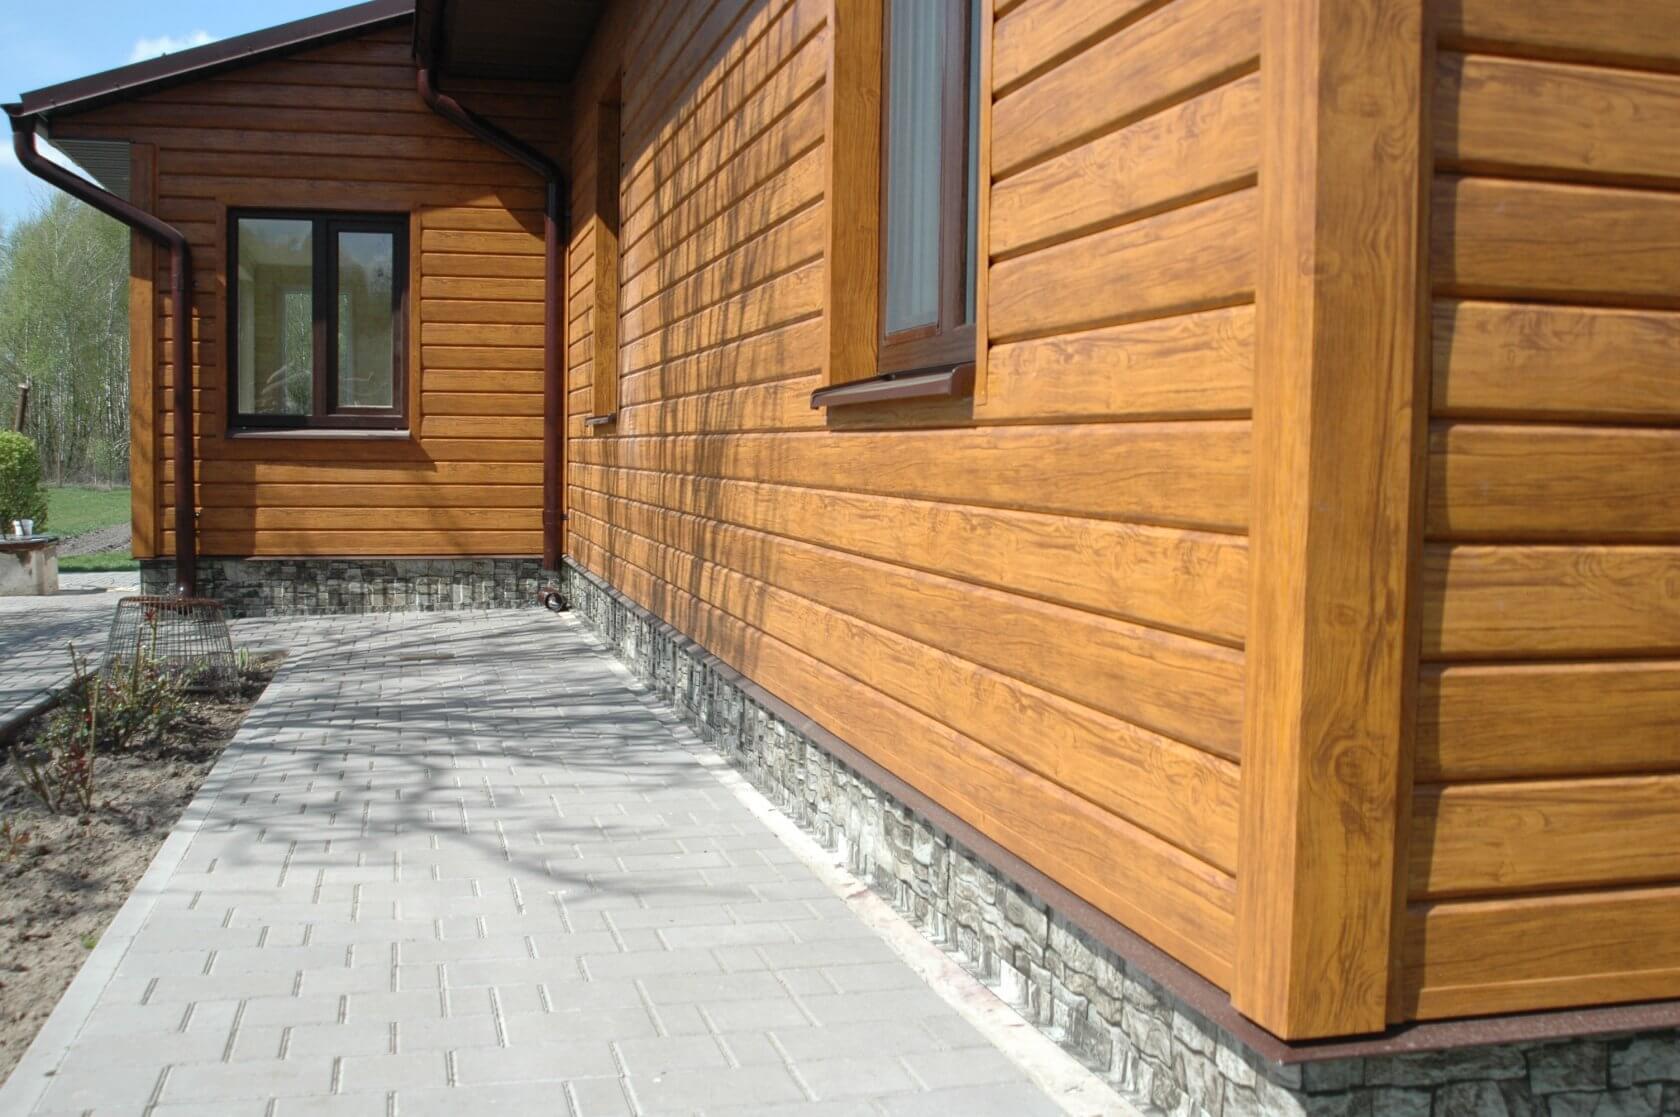 Металлический сайдинг как элемент отделки фасада зданий